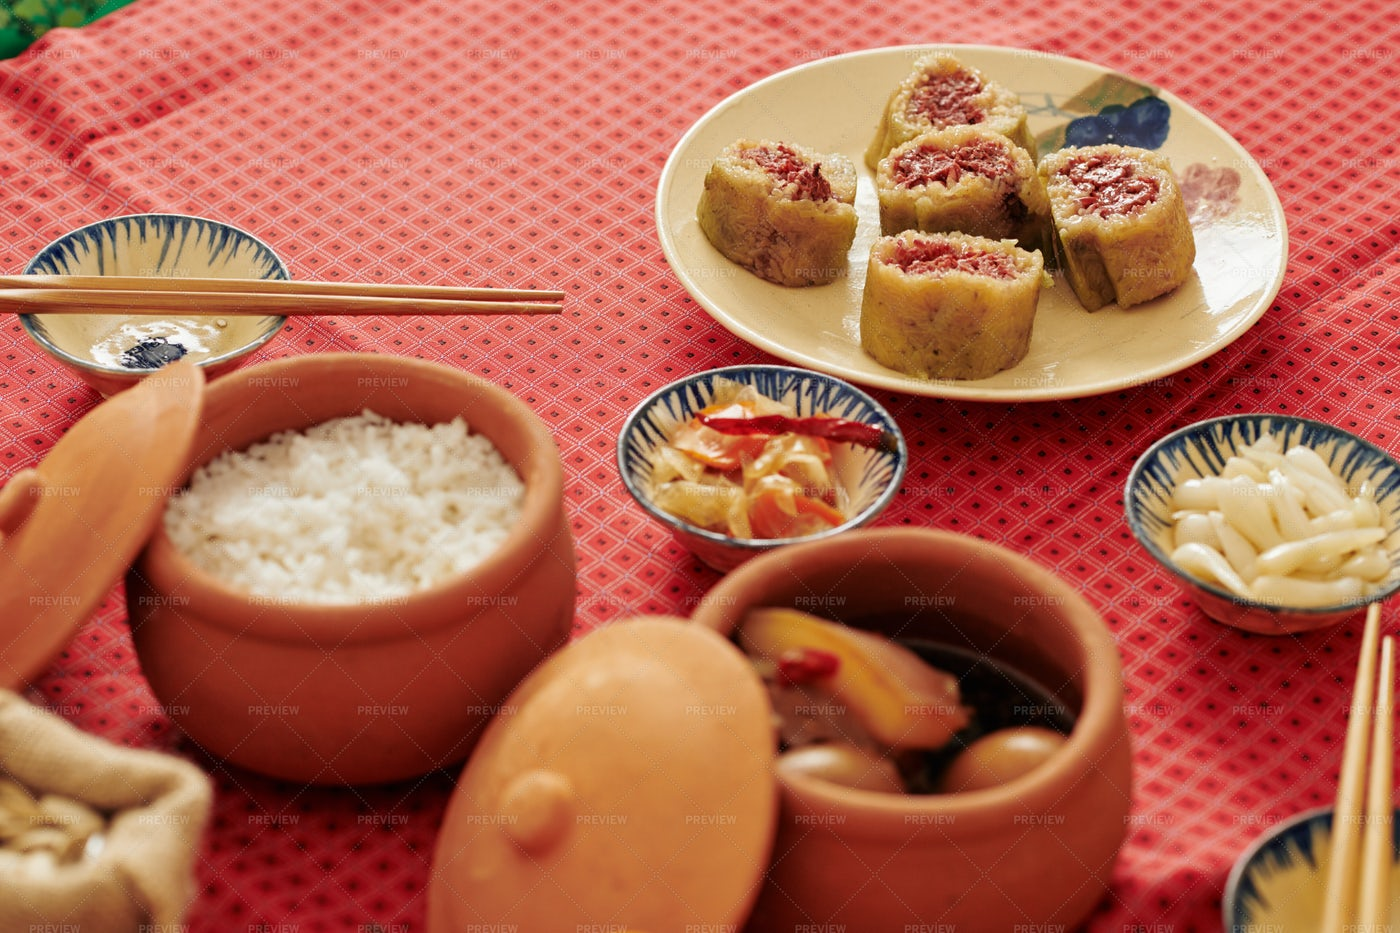 Lunar Year Celebration Dinner: Stock Photos